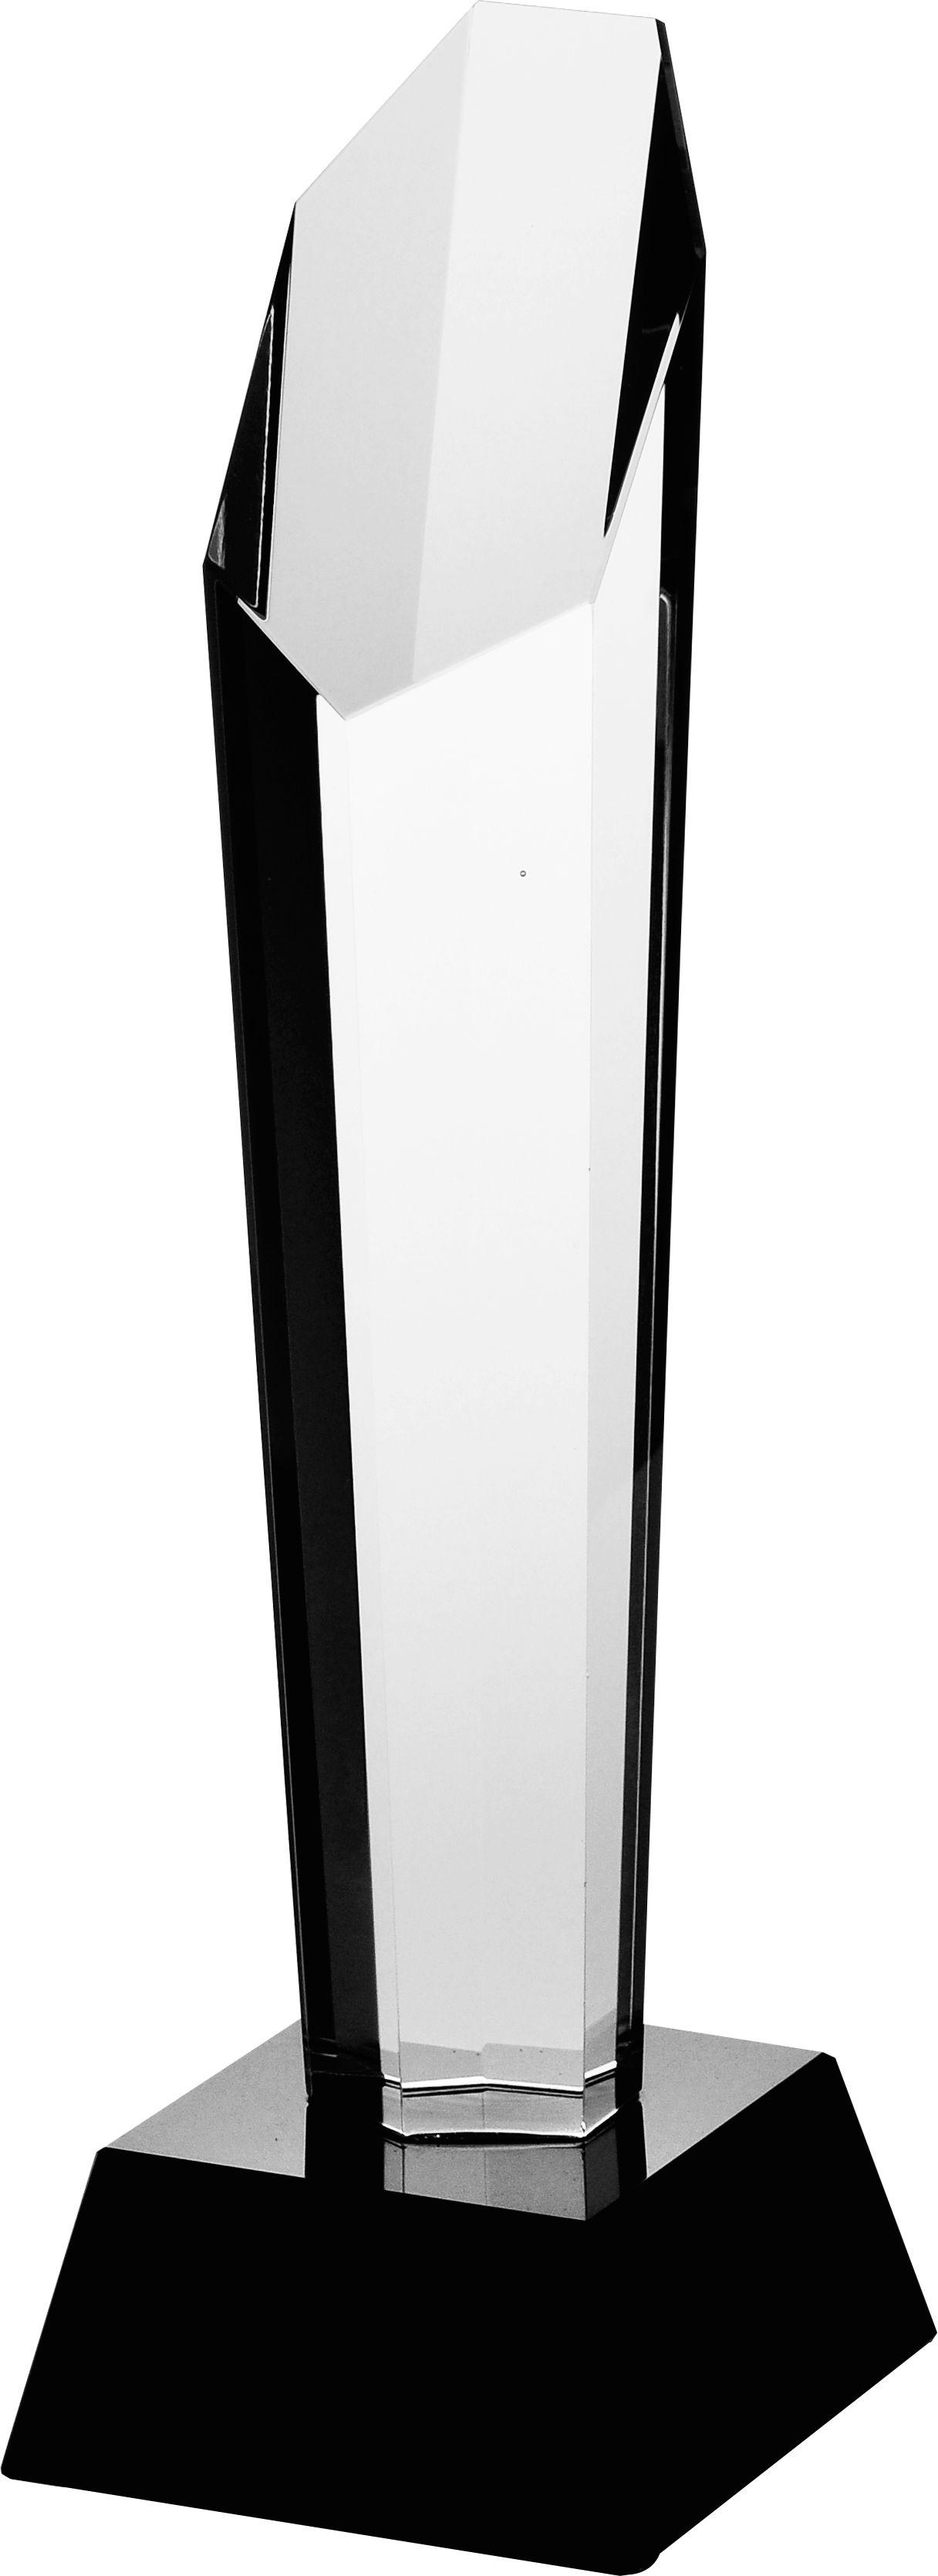 Szklana statuetka G003-30